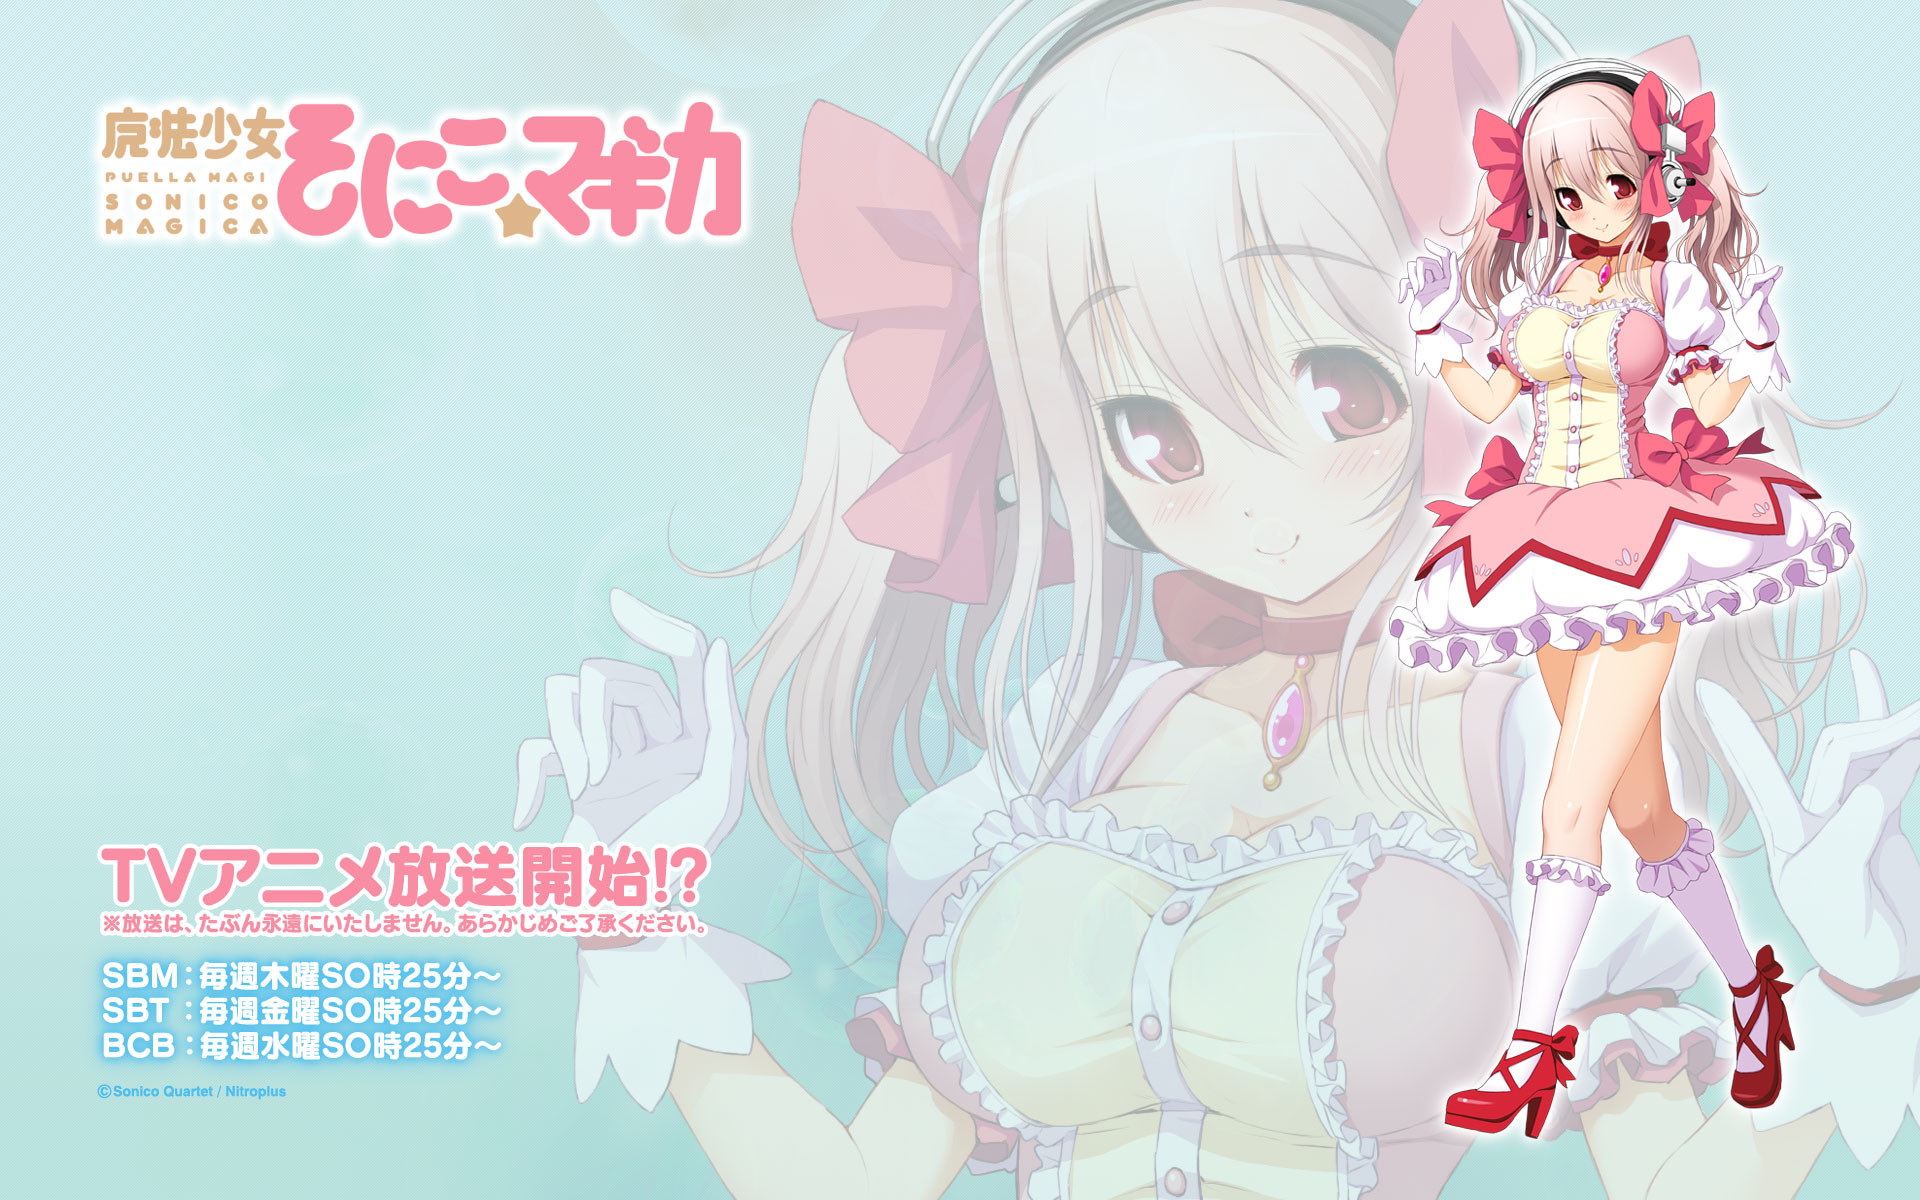 Cosplay dress gloves headphones mahou shoujo madoka magica nitroplus parody  pink hair sonico super sonico tsuji santa wallpaper | | 74536 |  …